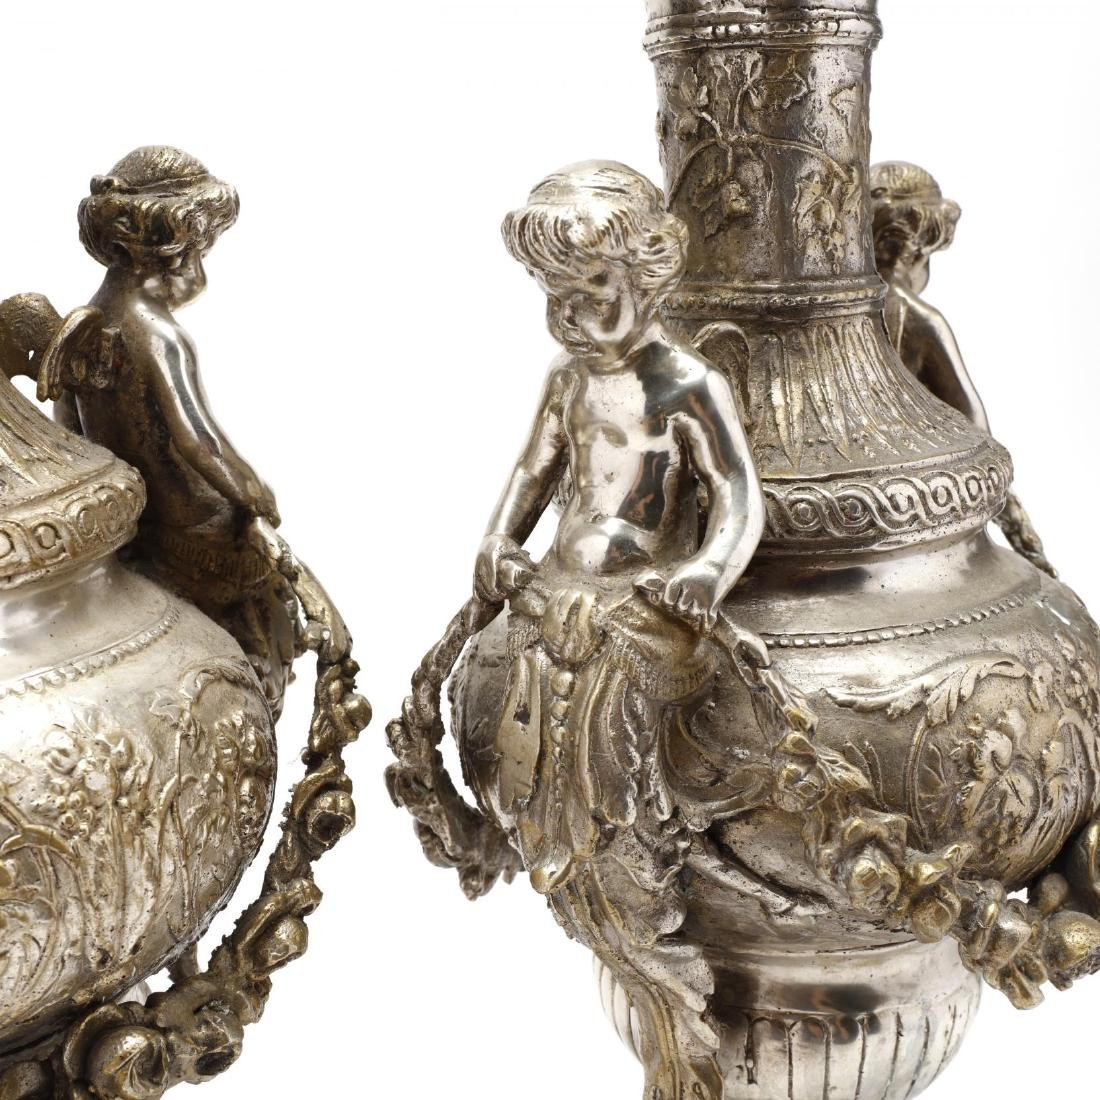 A Pair of Silvertone Renaissance Revival Style Urns - 3